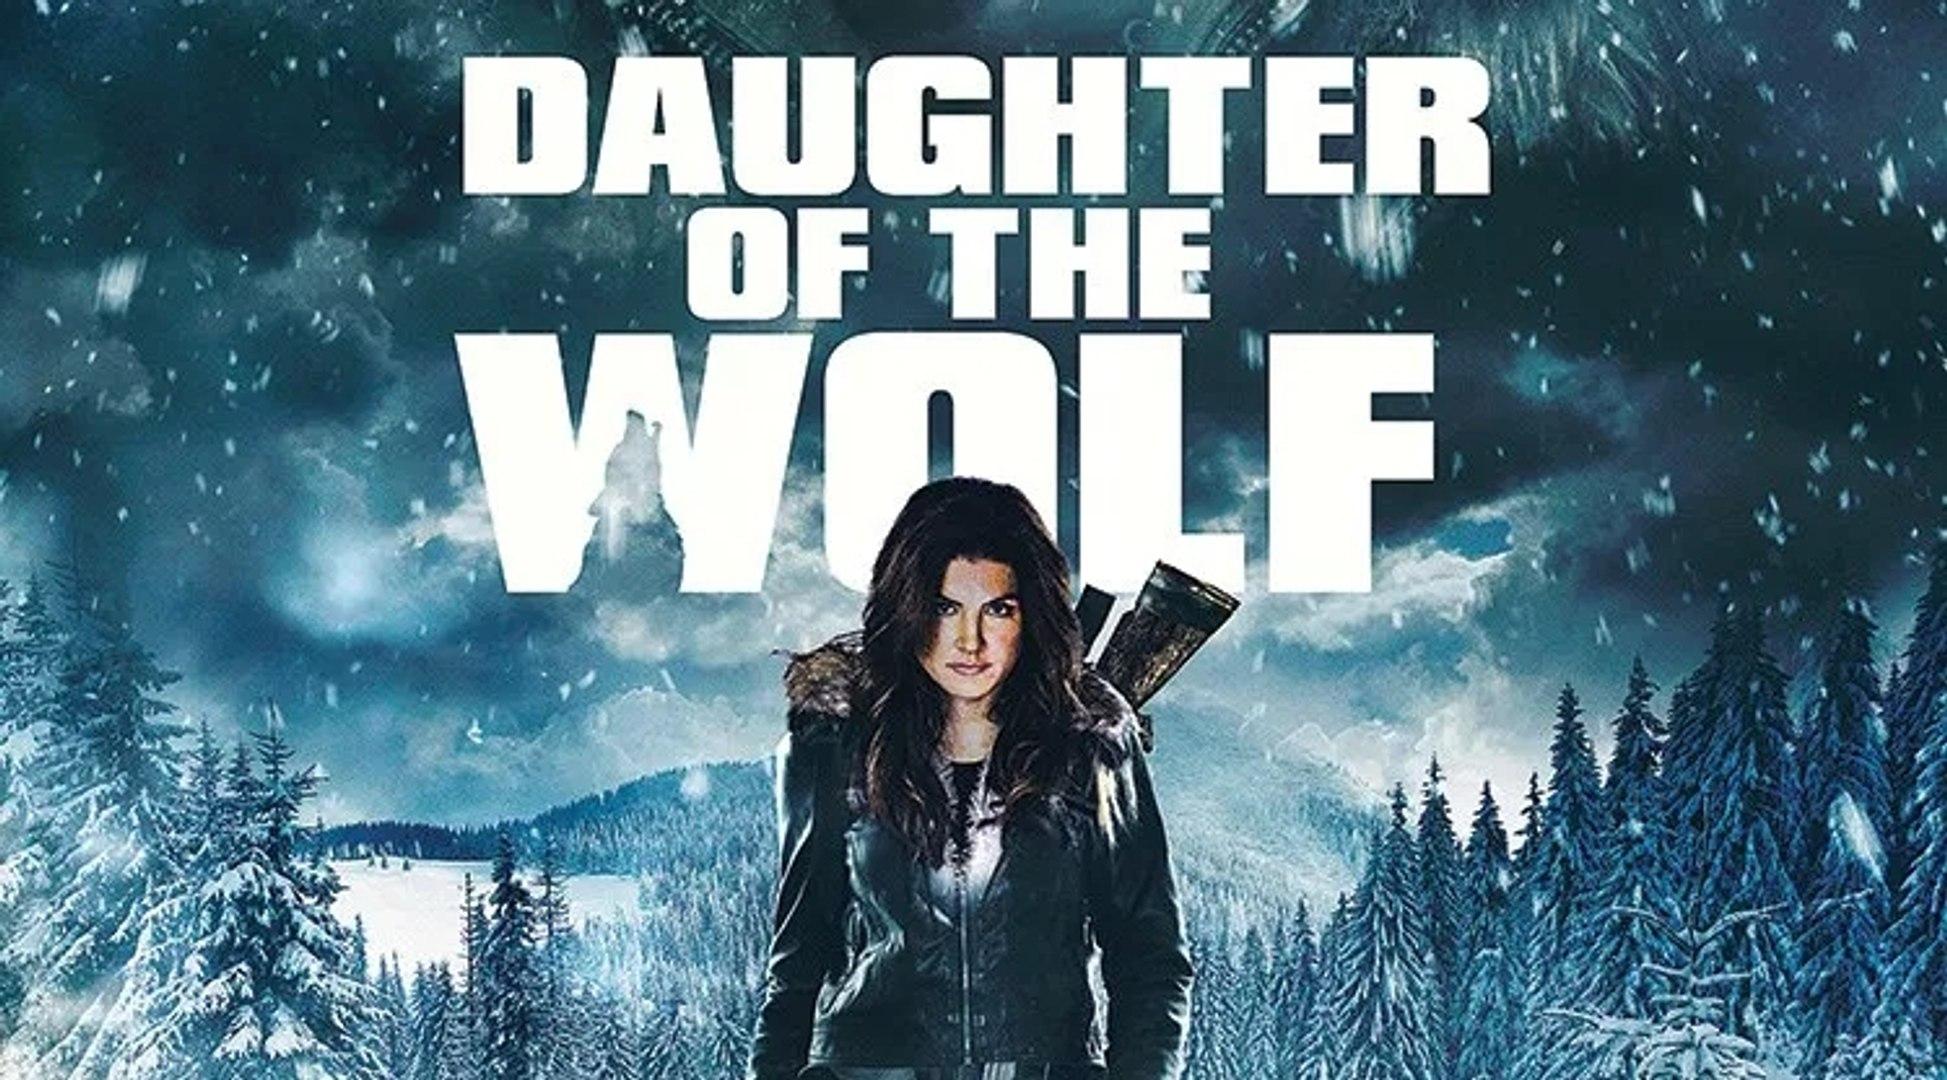 DAUGHTER OF THE WOLF Movie - Gina Carano, Richard Dreyfuss ...